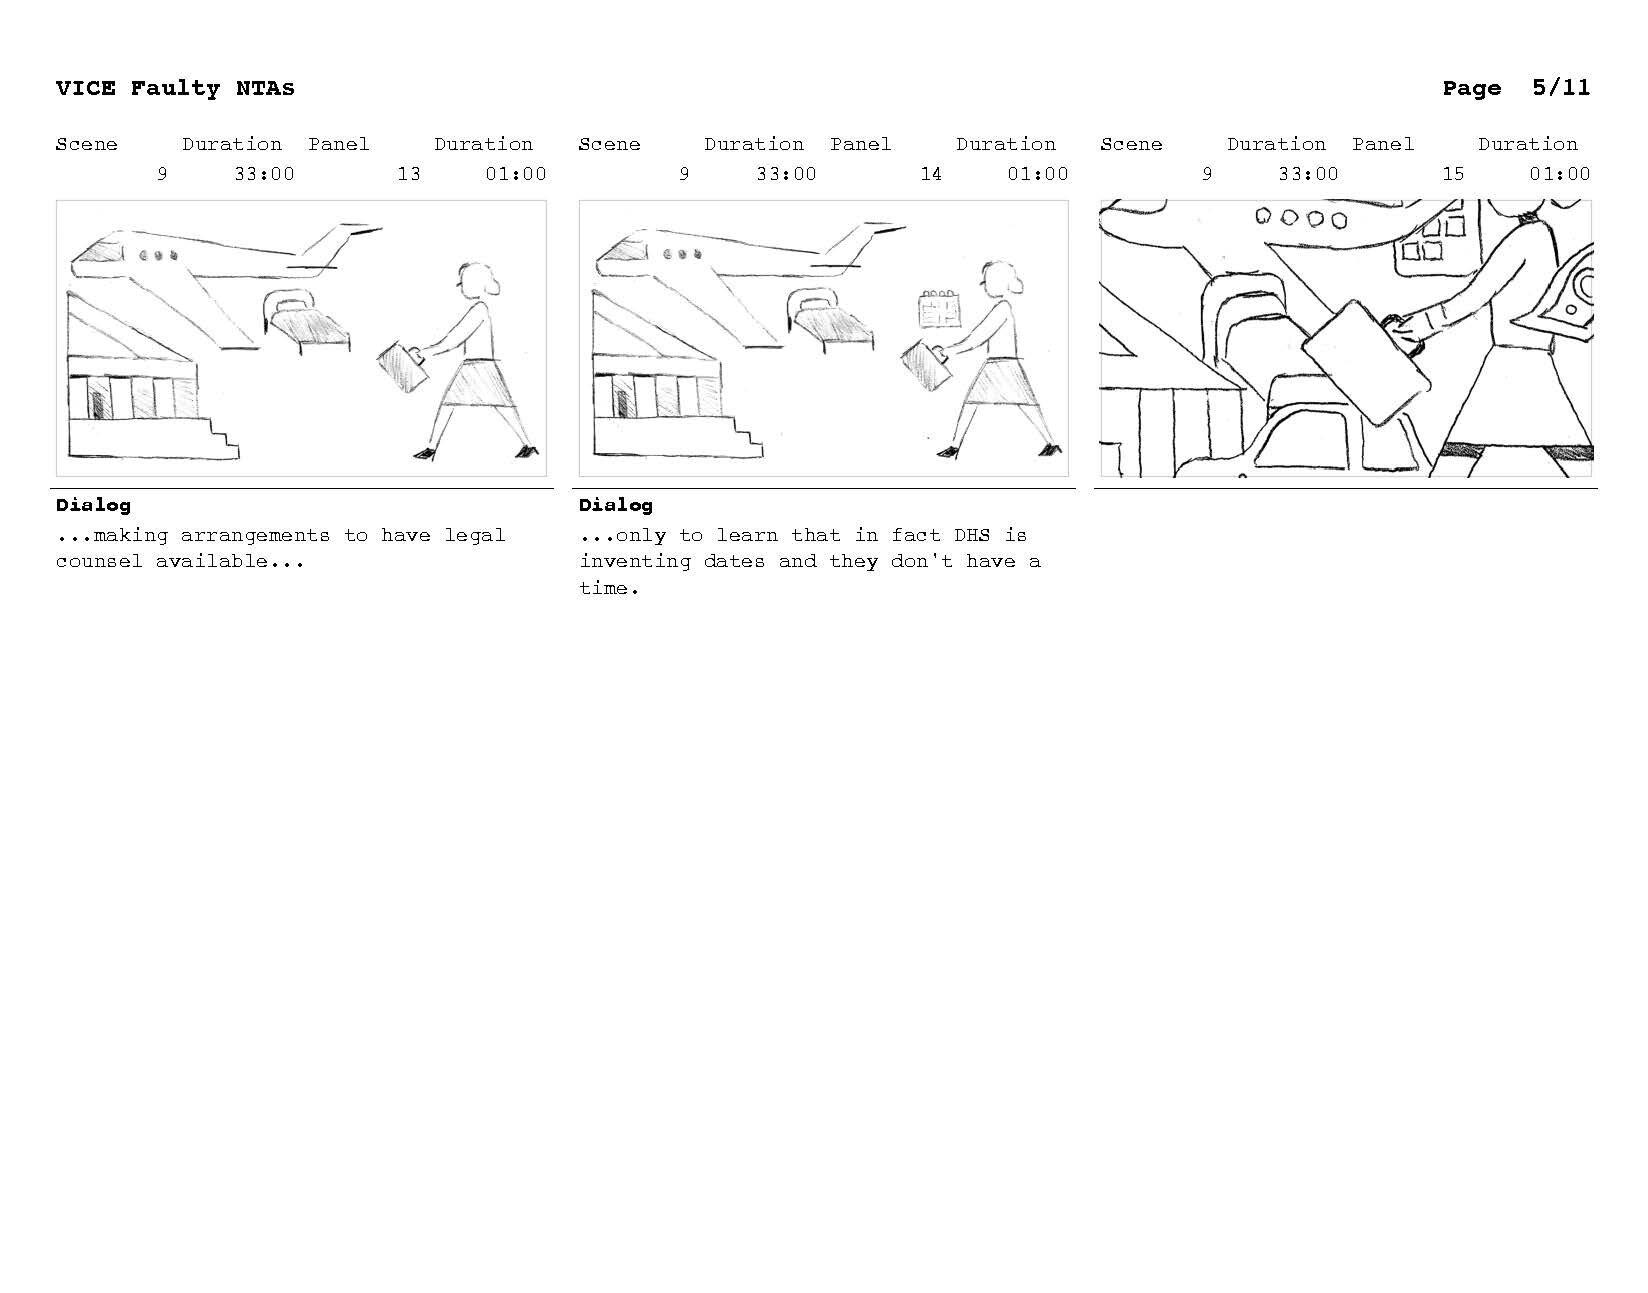 VICE News Tonight - Faulty NTAs storyboard_Page_05.jpg